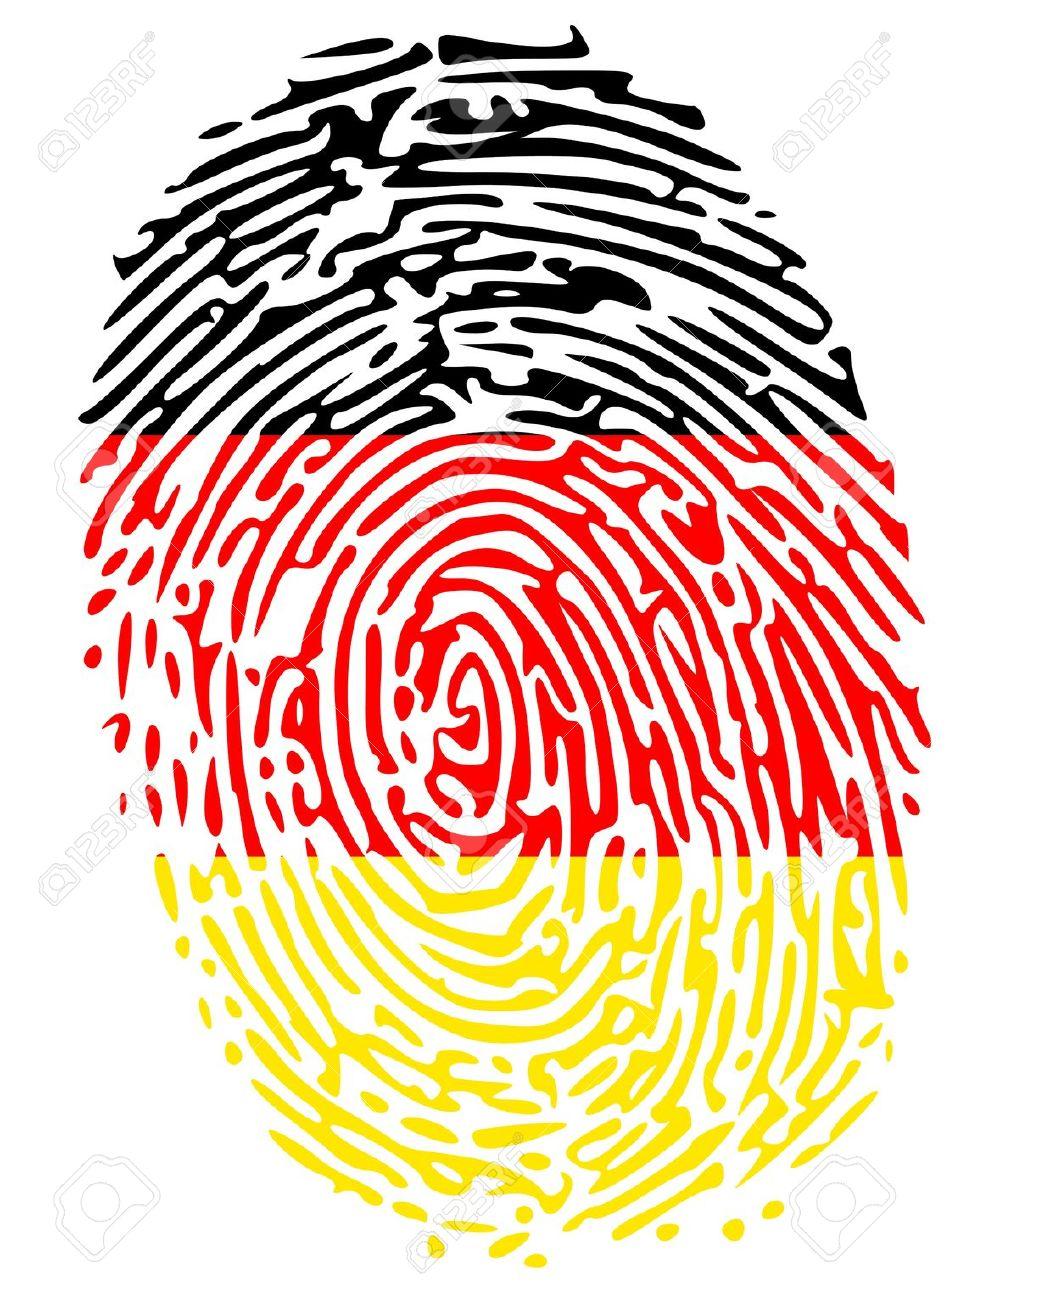 Thumbprint Flag Colors Of Germany Royalty Free Cliparts, Vectors.